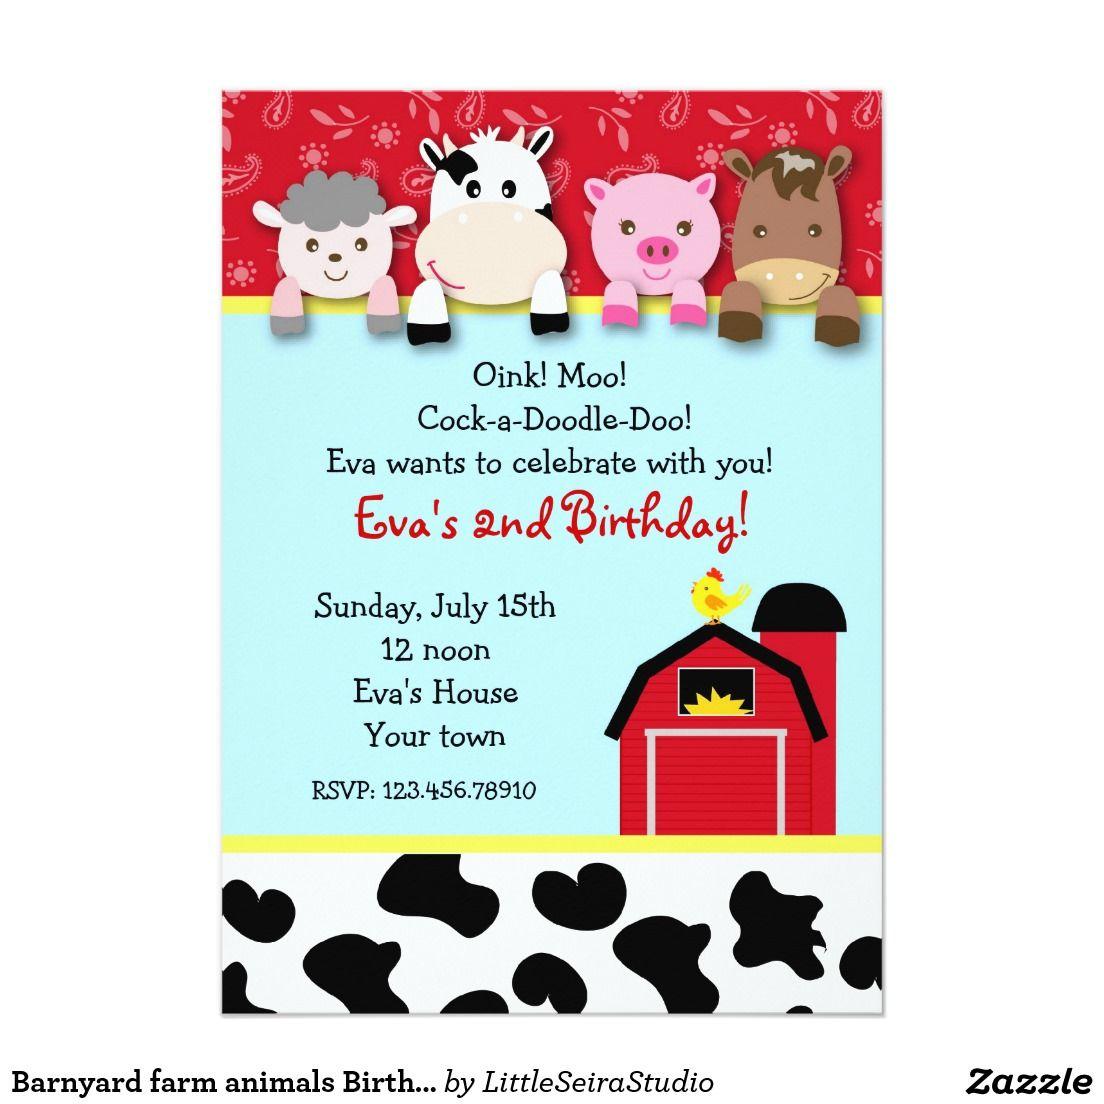 Barnyard farm animals Birthday Party invitations   Matt\'s 3rd Bday ...